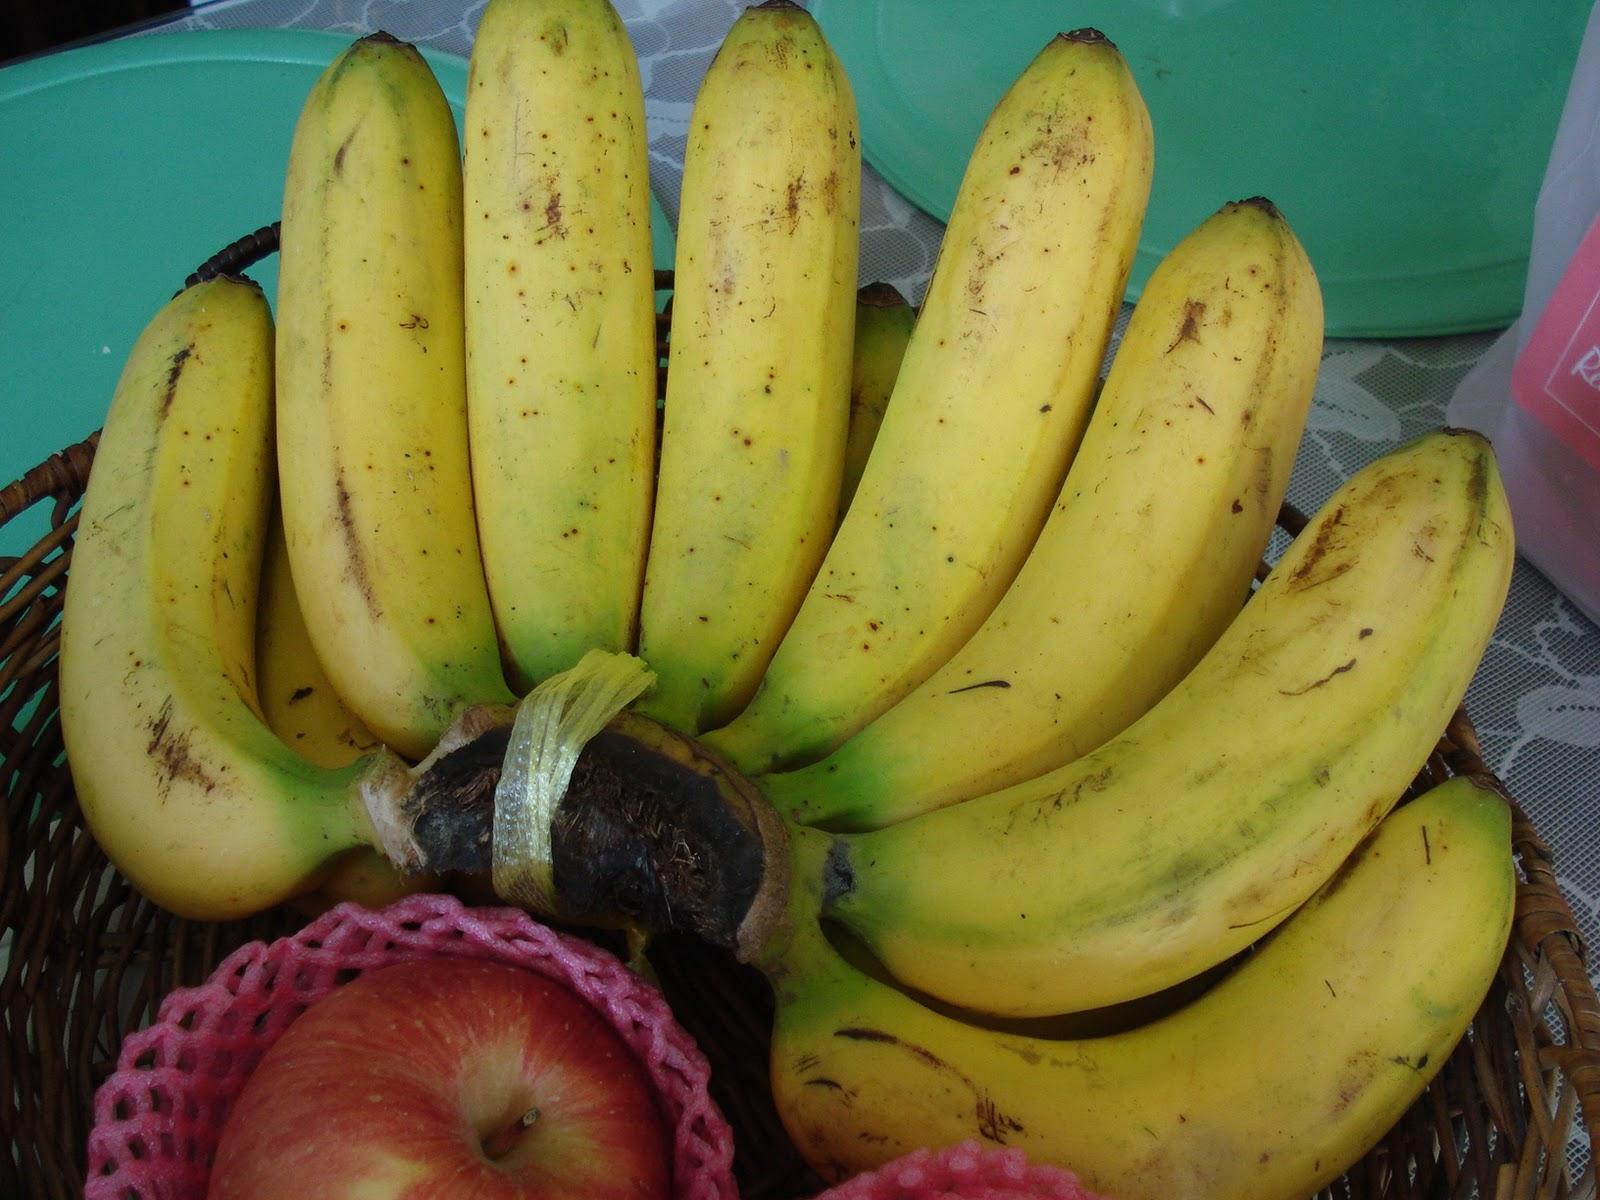 lakatan banana flesh extract as an